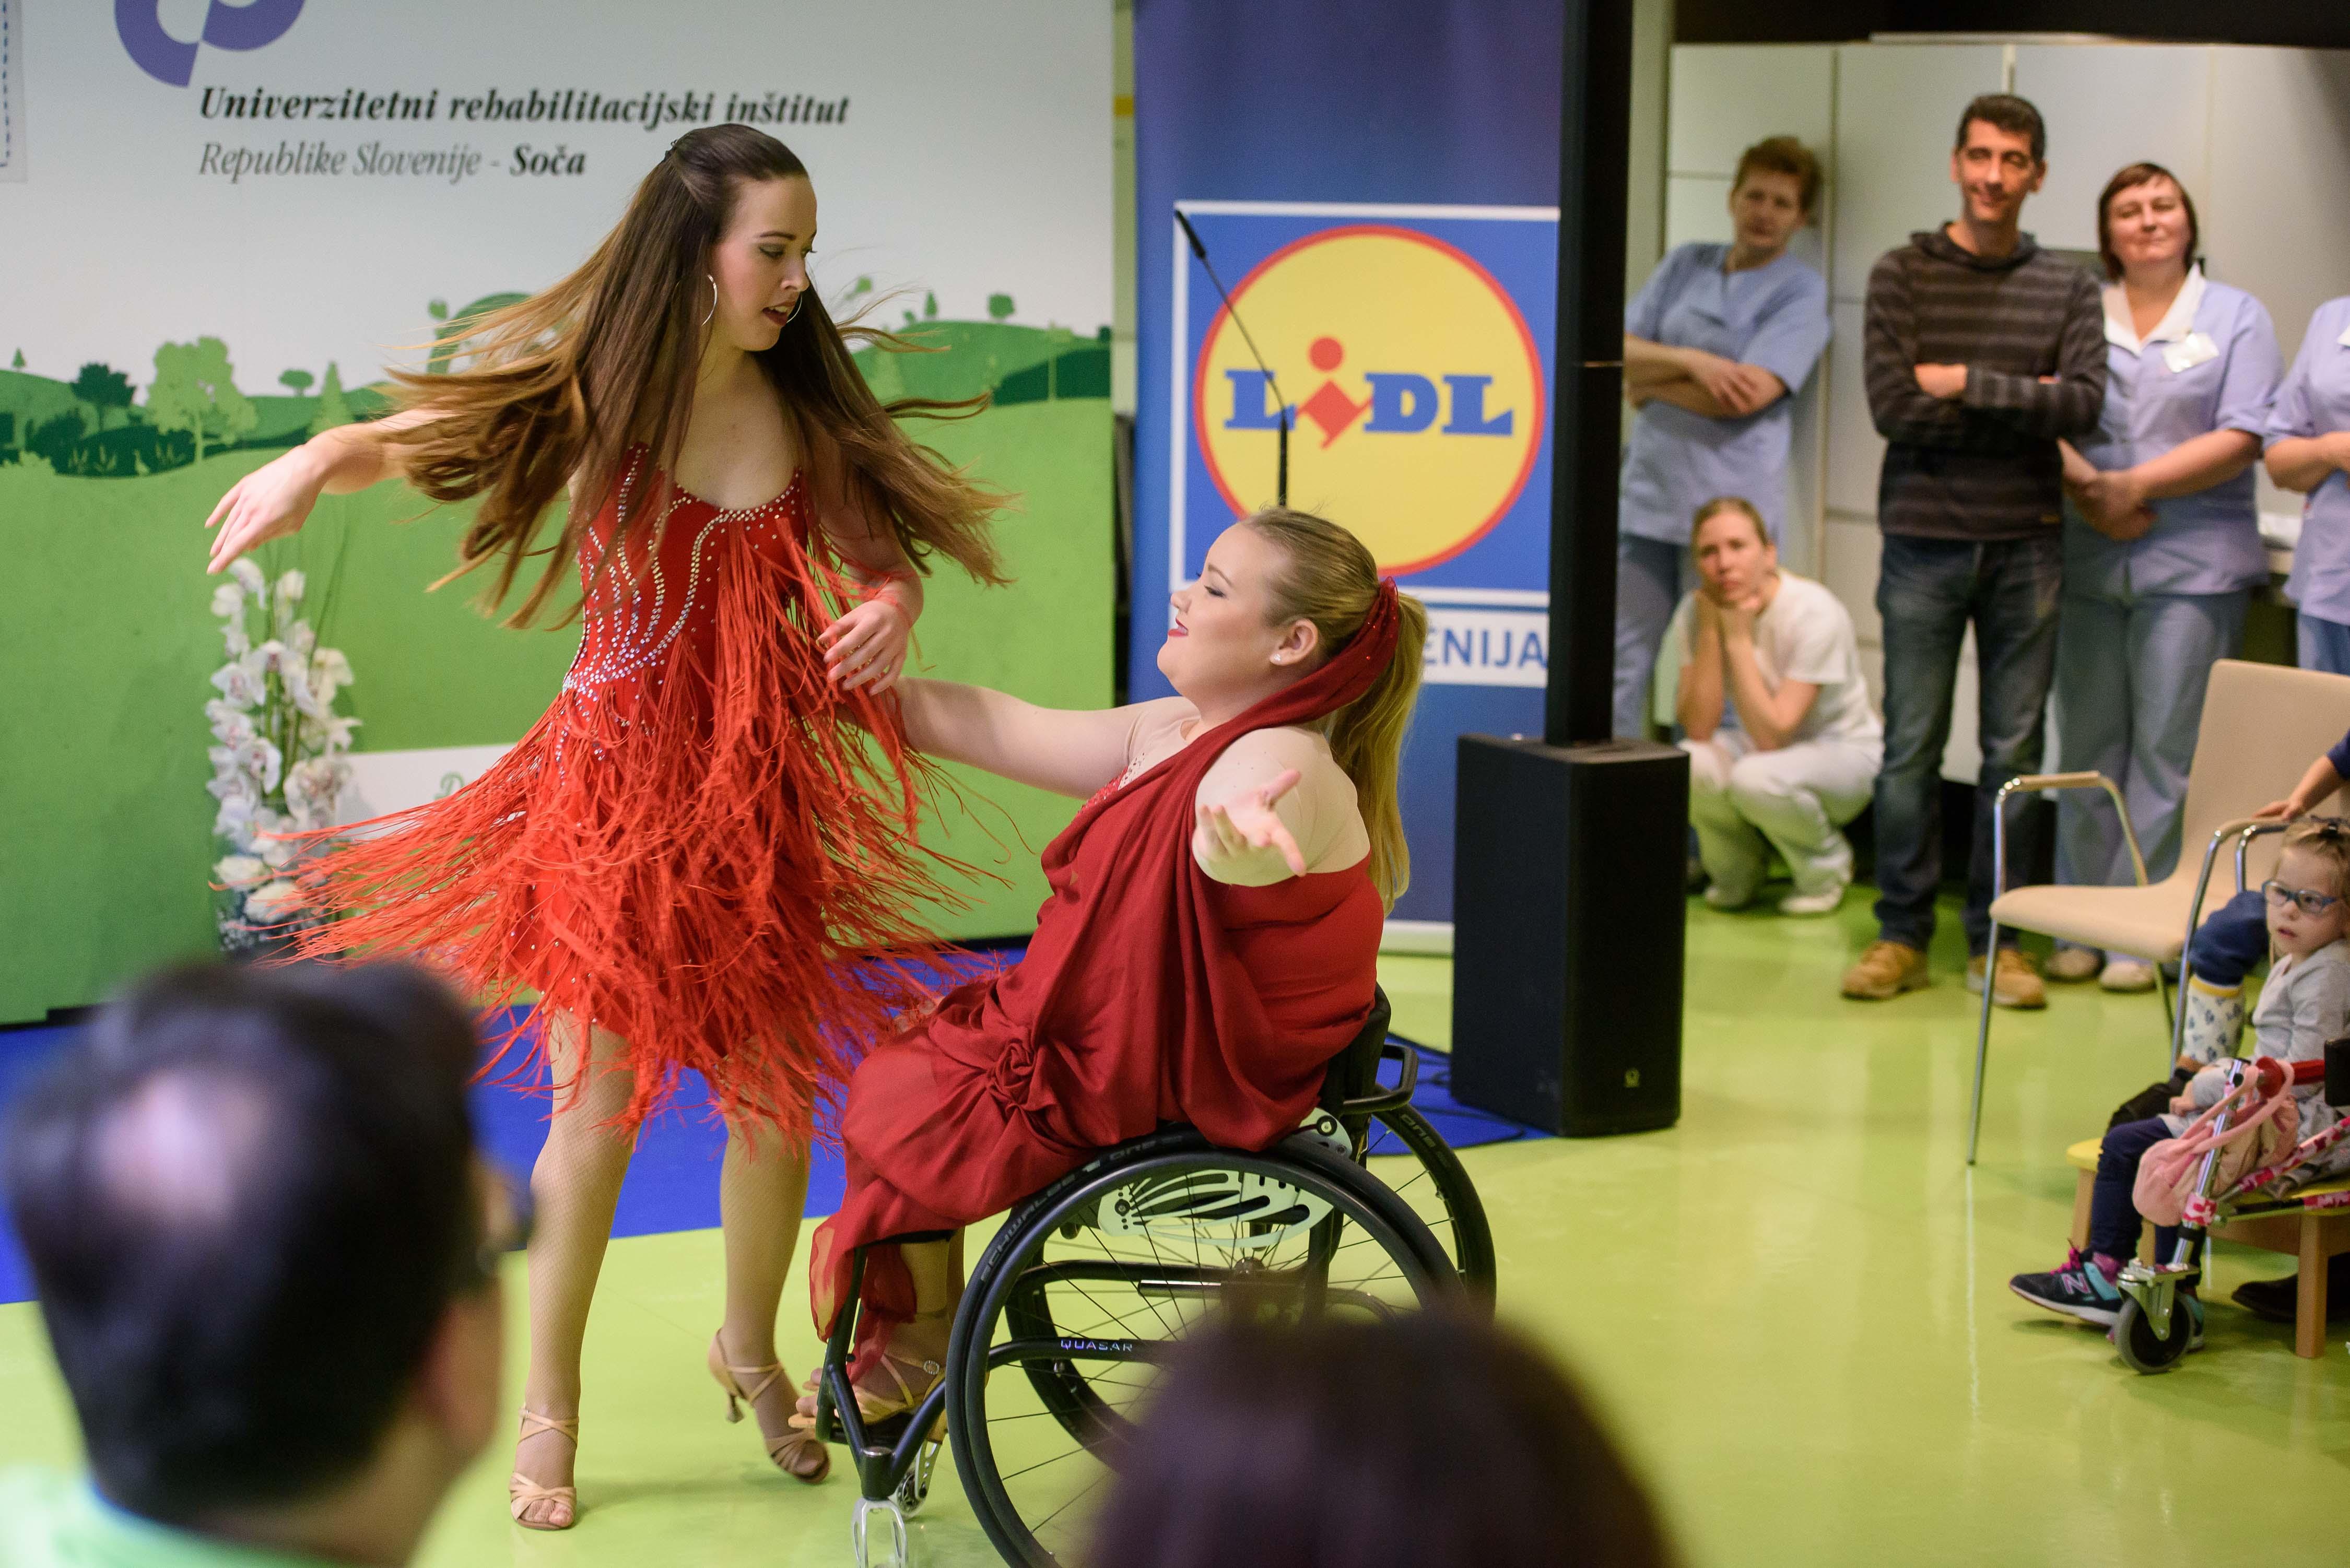 Dve dekleti plešeta, ena od njiju je na invalidskem vozičku